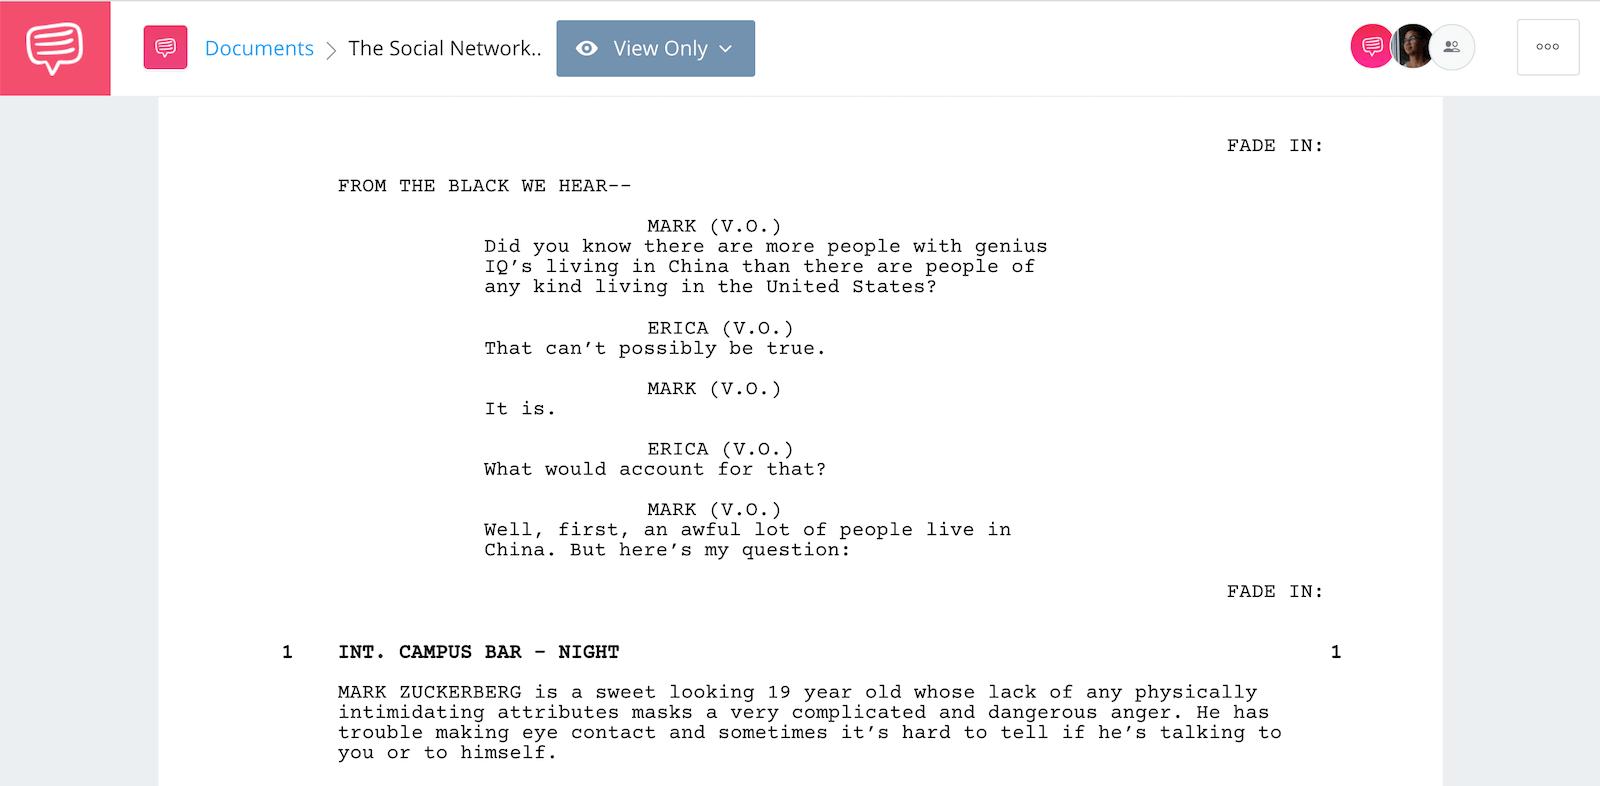 Screenwriter Salary - The Social Network - StudioBinder Screenwriting Software